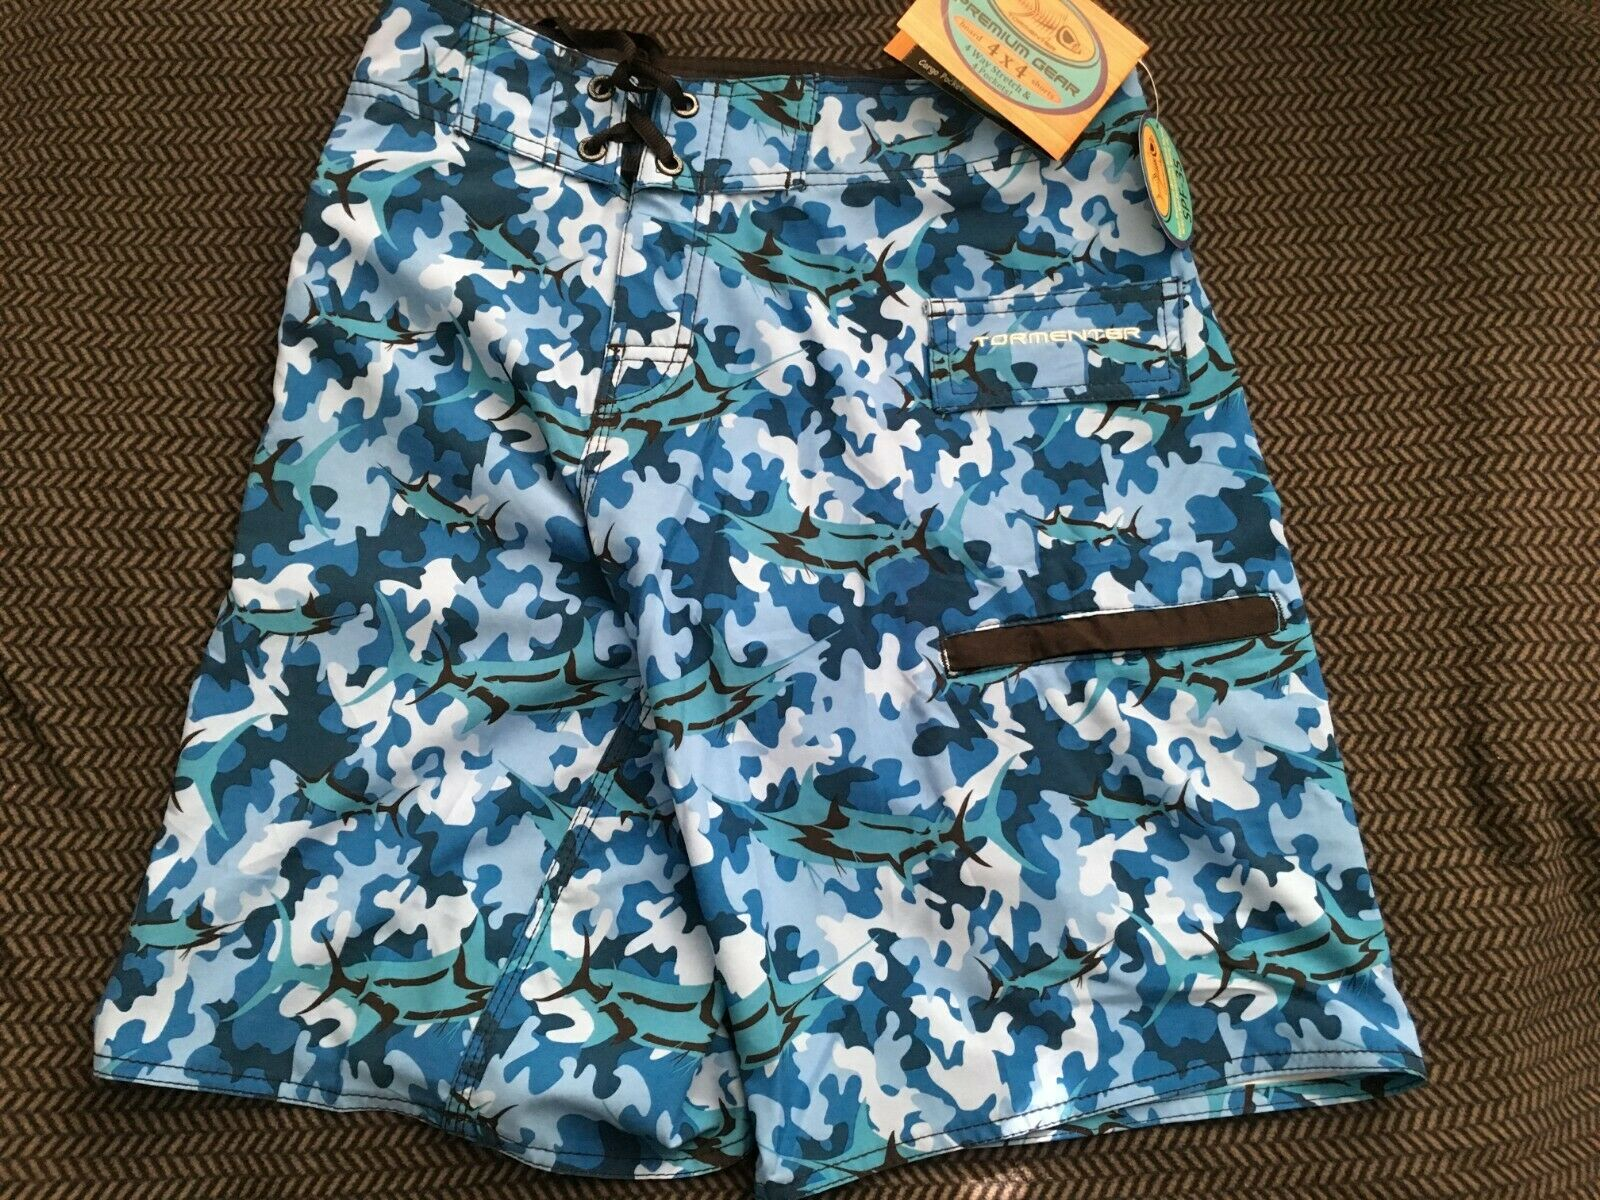 Tormenter Men's Premium Gear 4X4 Stretch Board Shorts Sz 36 MSRP  bluee Camo